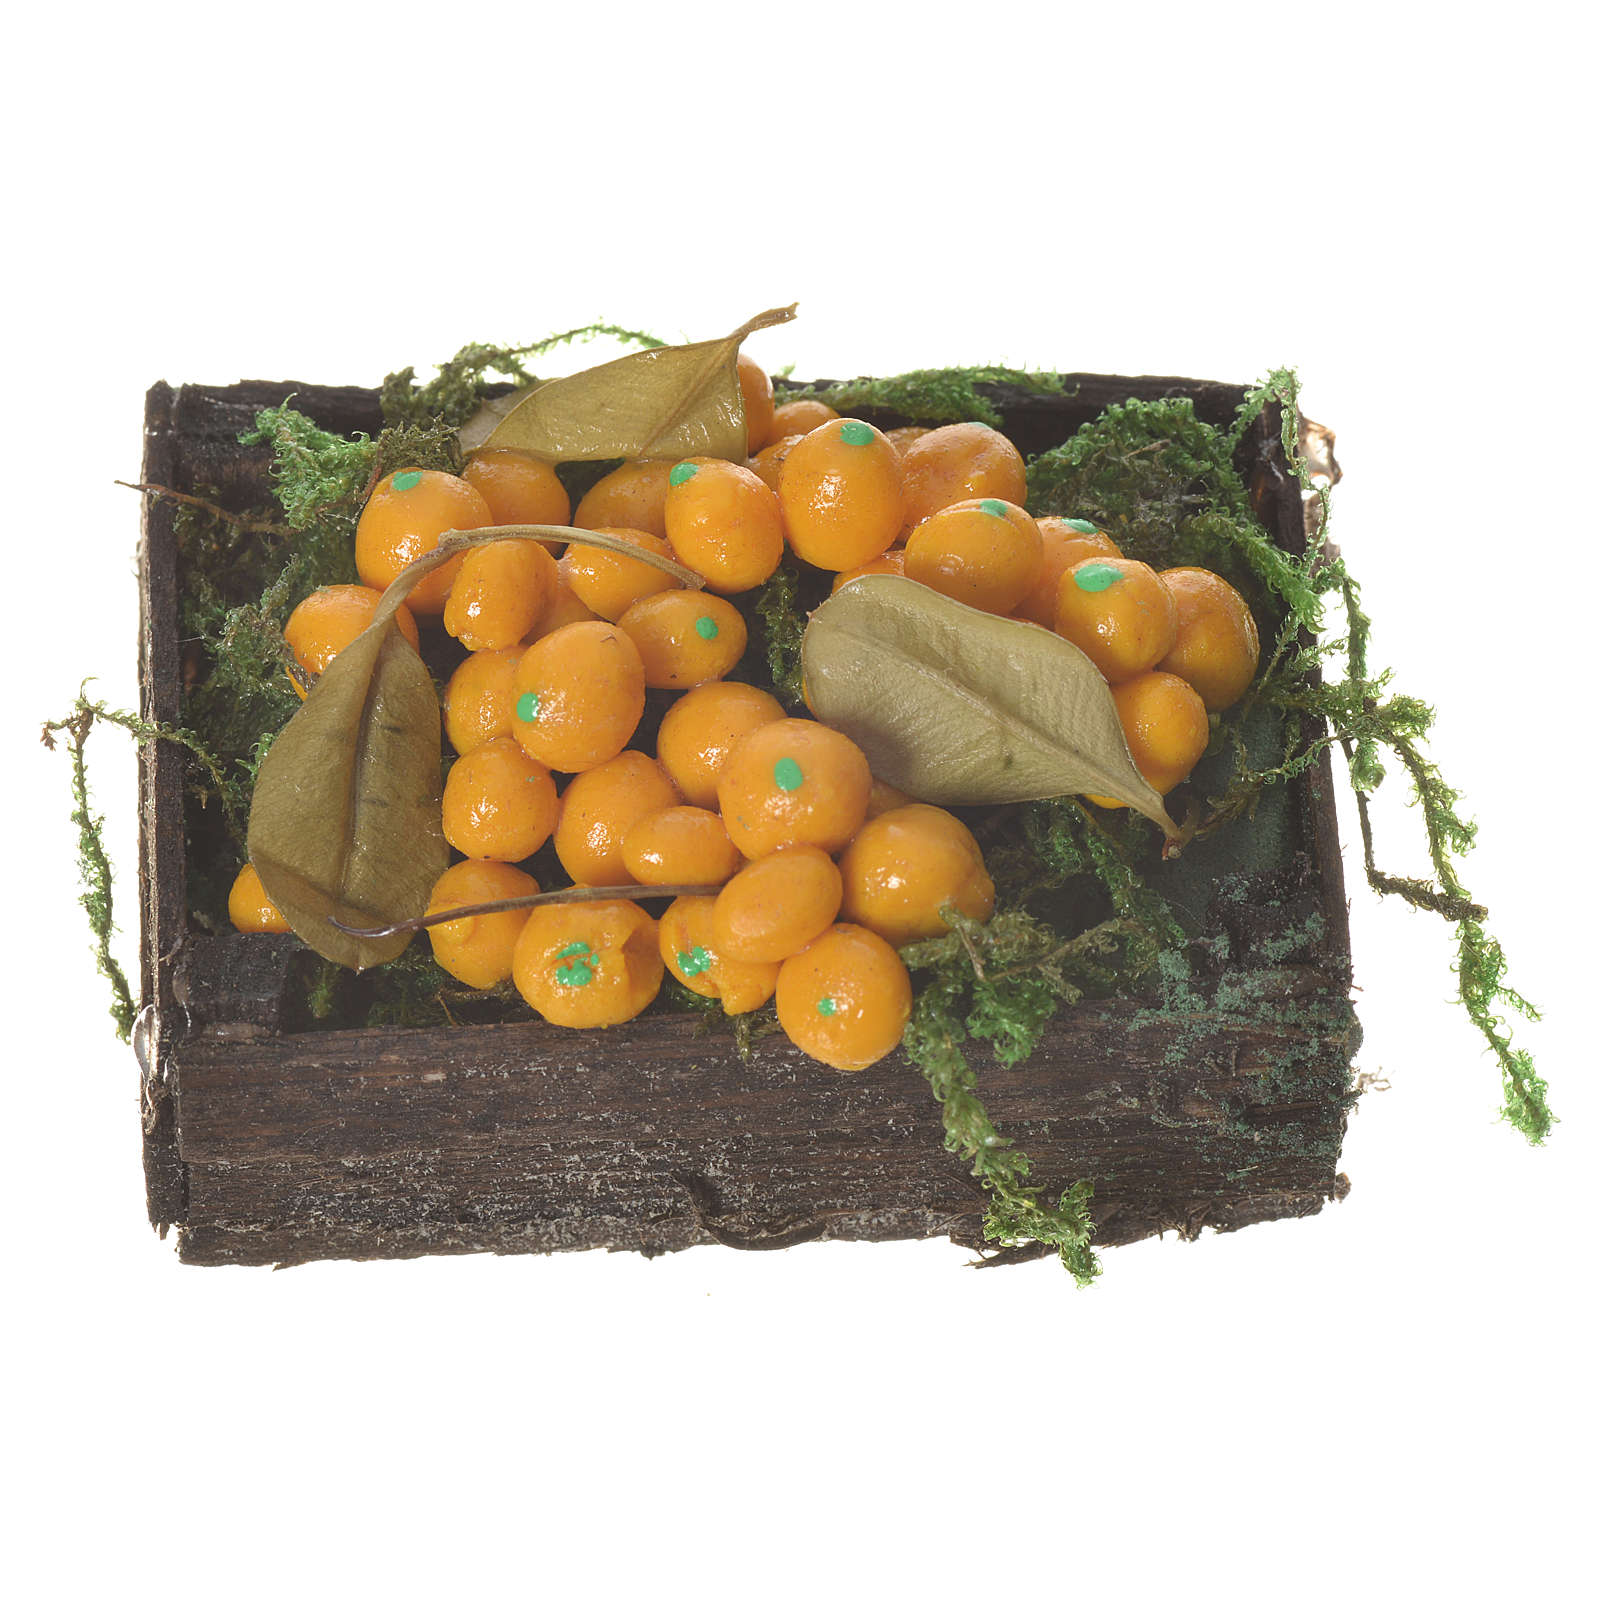 Cassetta frutta arancione cera figure presepe 20-24 cm 4